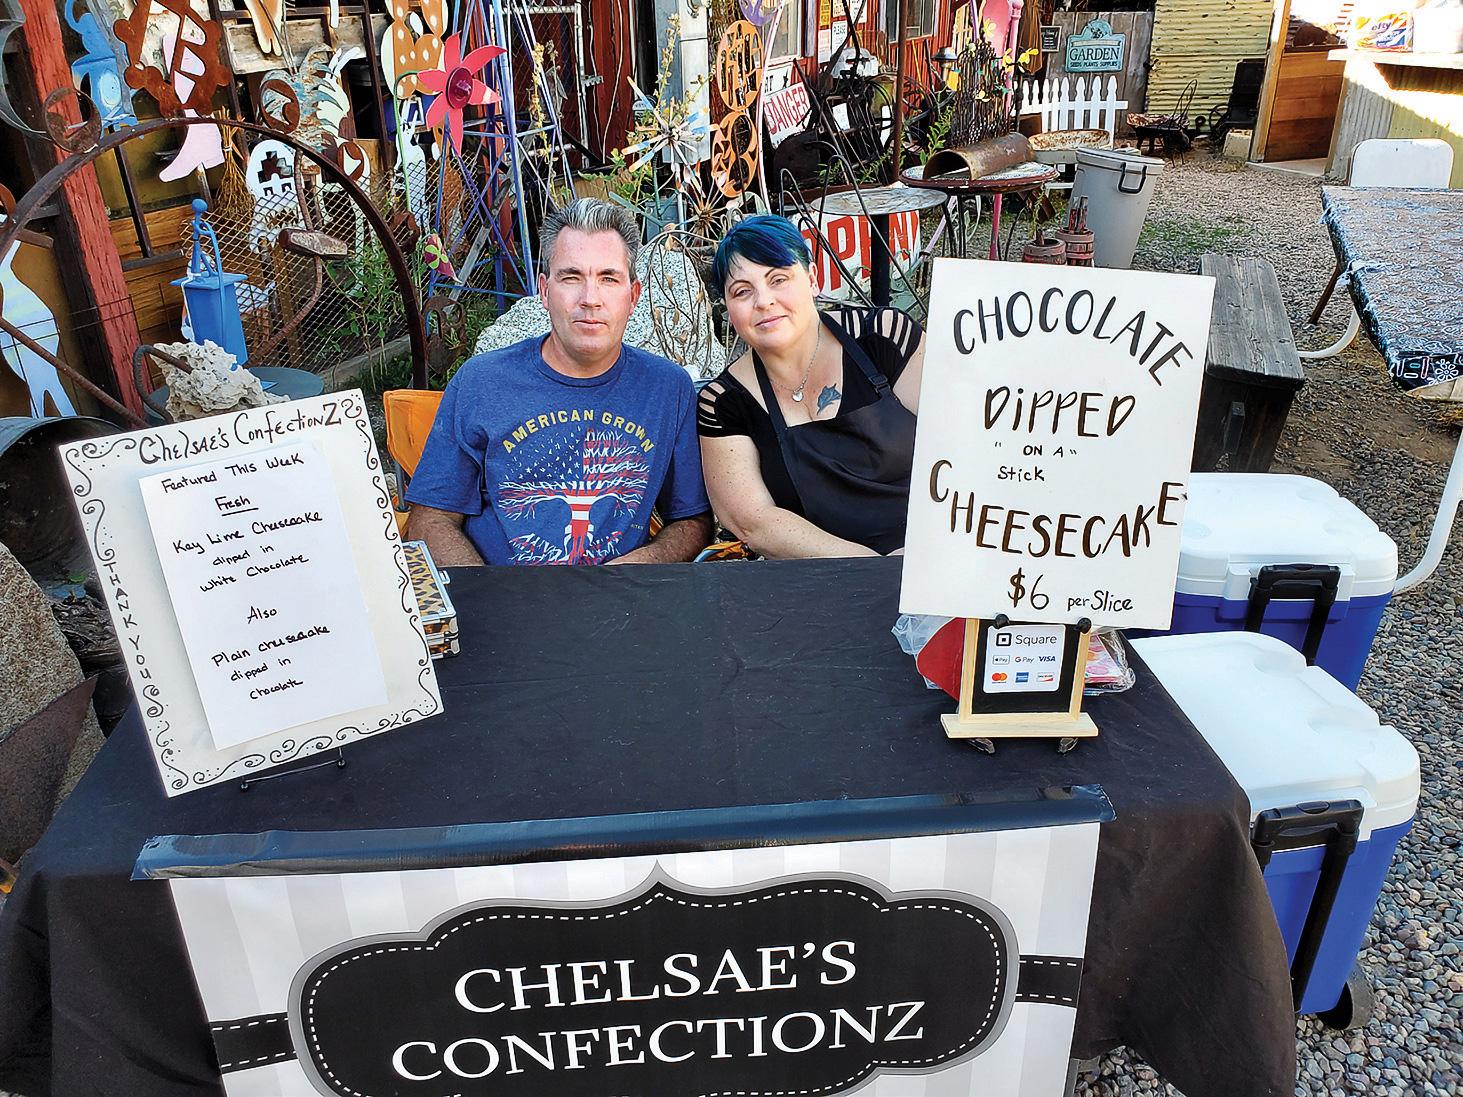 Chelsae's Confectionz Etc.: Chelsae and Simon Hanson